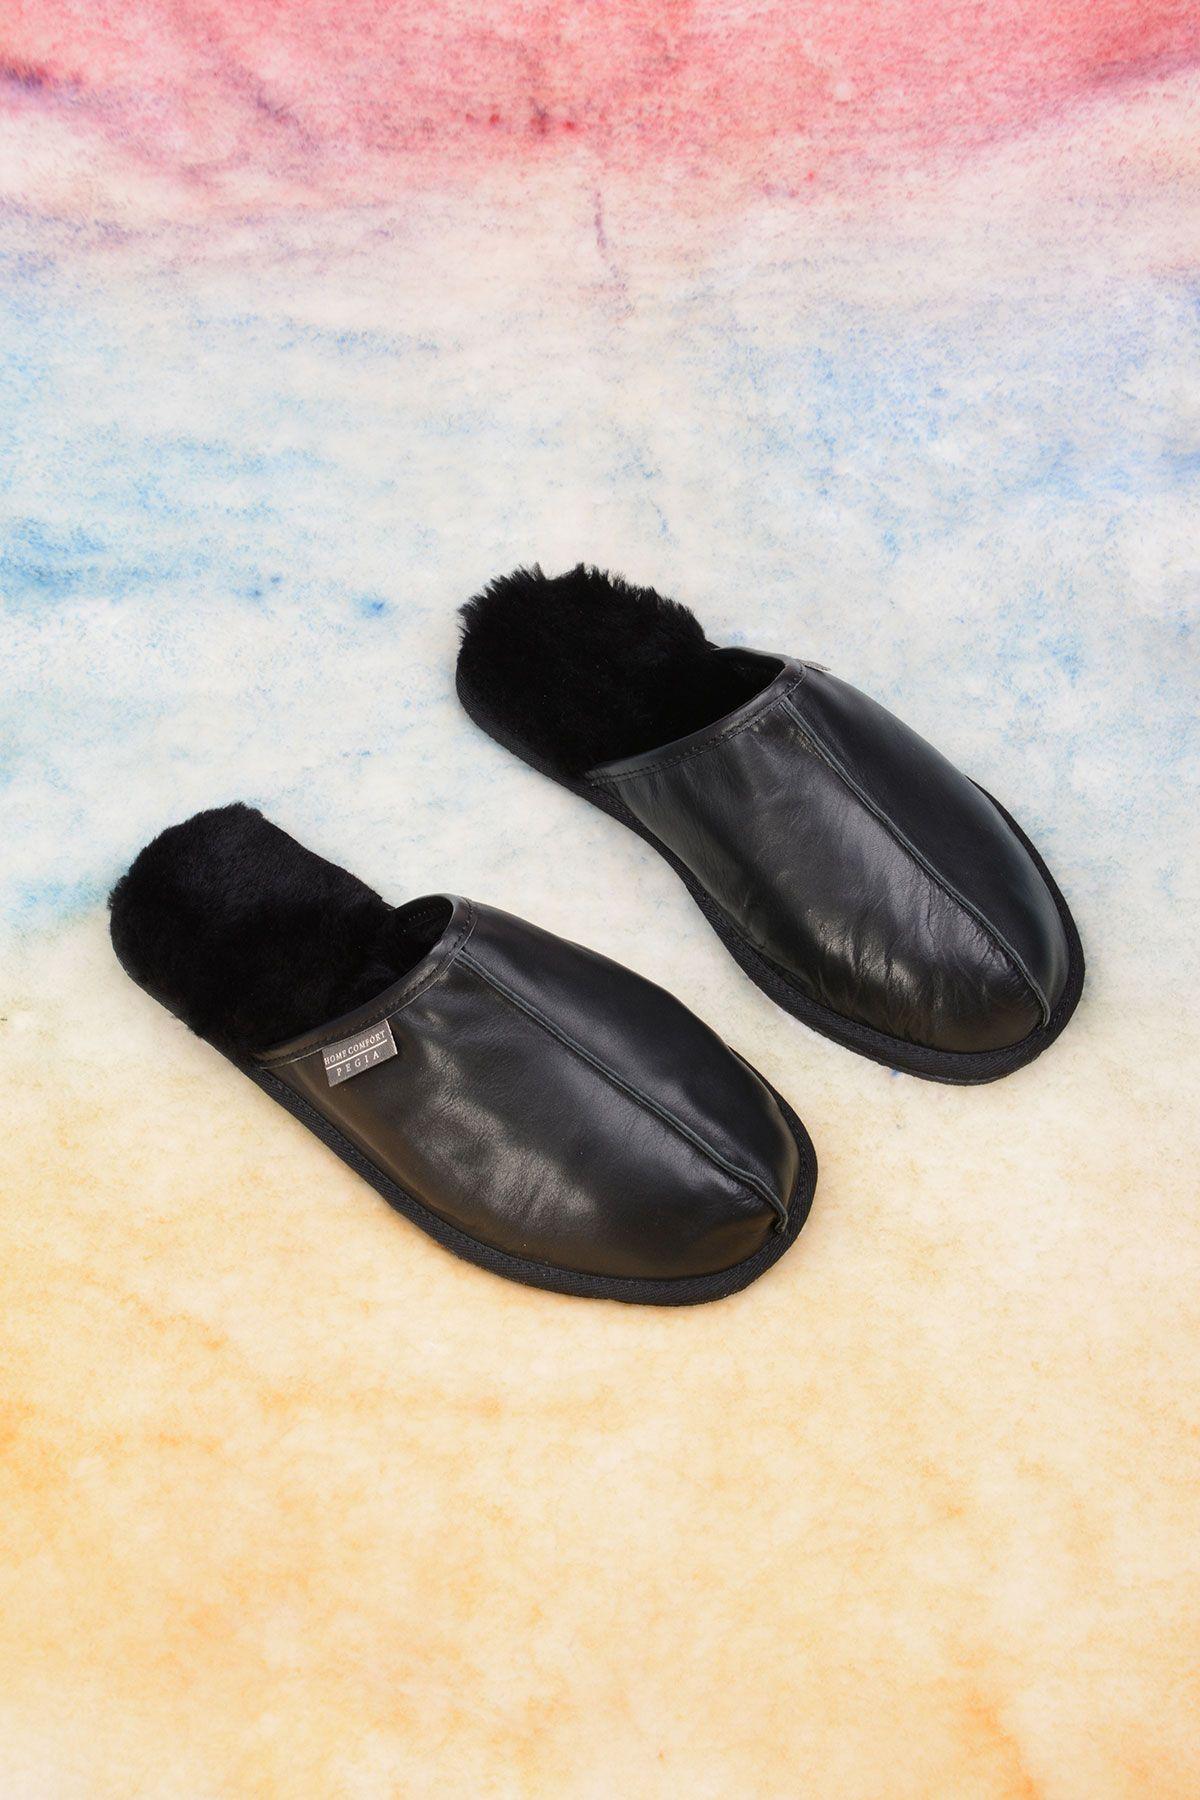 Pegia Genuine Leather Men's House Slippers 111012 Black